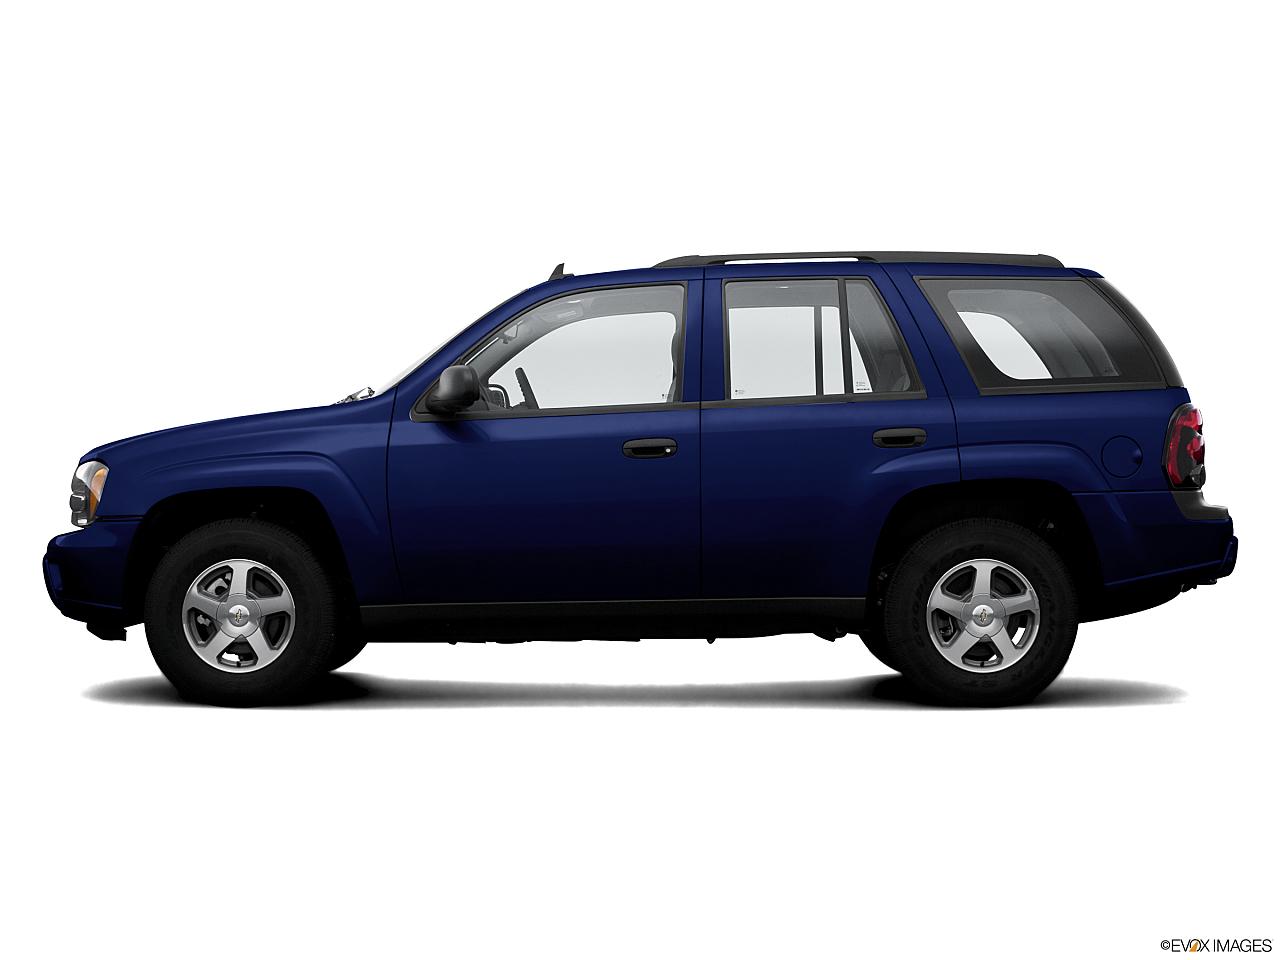 Chevy 2012 chevy trailblazer : 2006 Chevrolet TrailBlazer LS 4dr SUV 4WD w/1SA - Research - GrooveCar